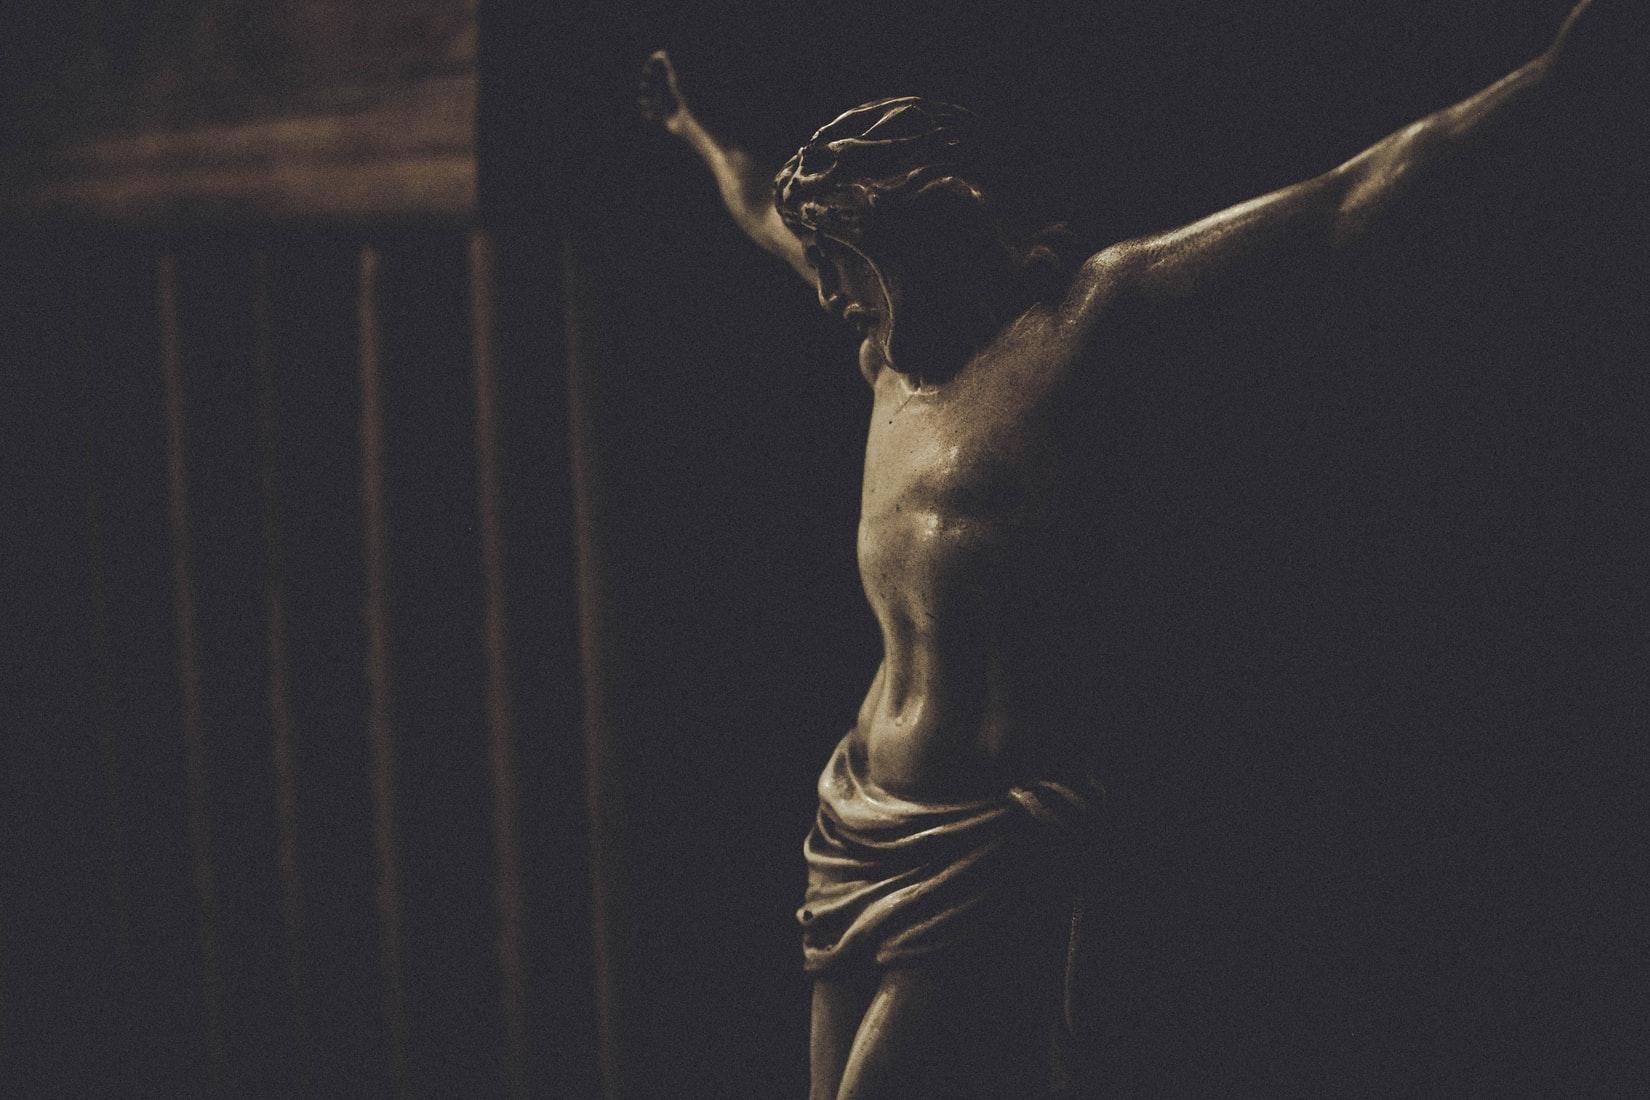 Jesus Christ crucifix statue